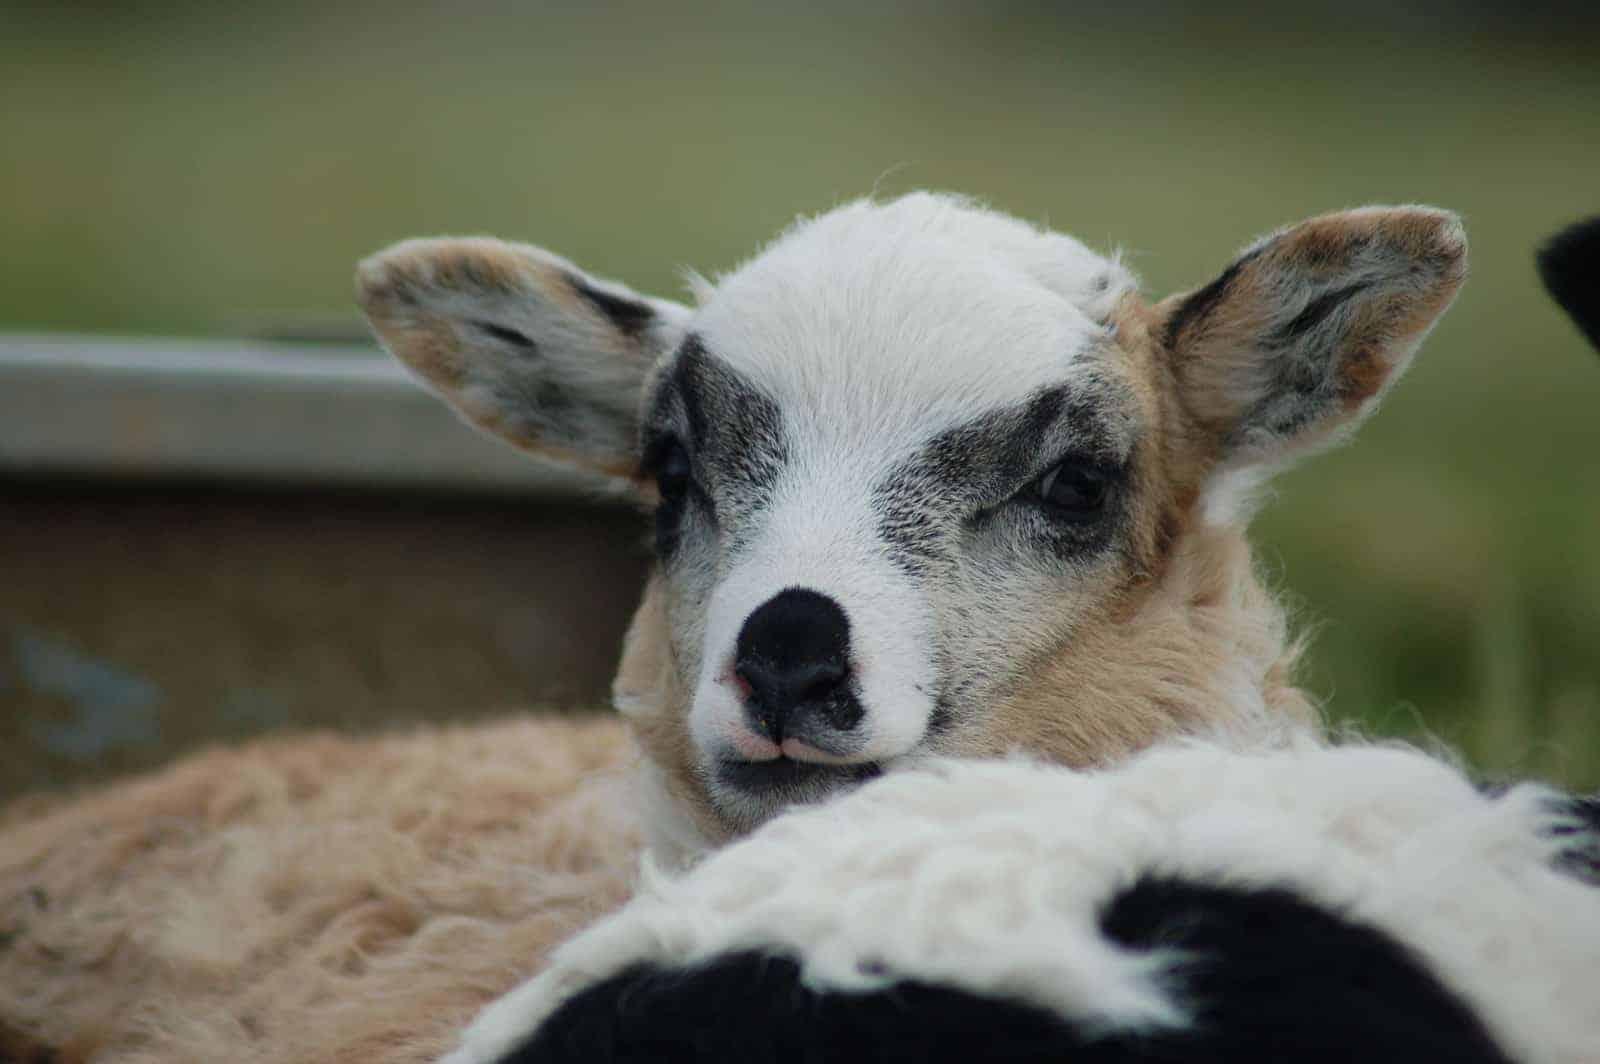 patchwork sheep smudge cute lamb golden soay cross shetland jacob sheep